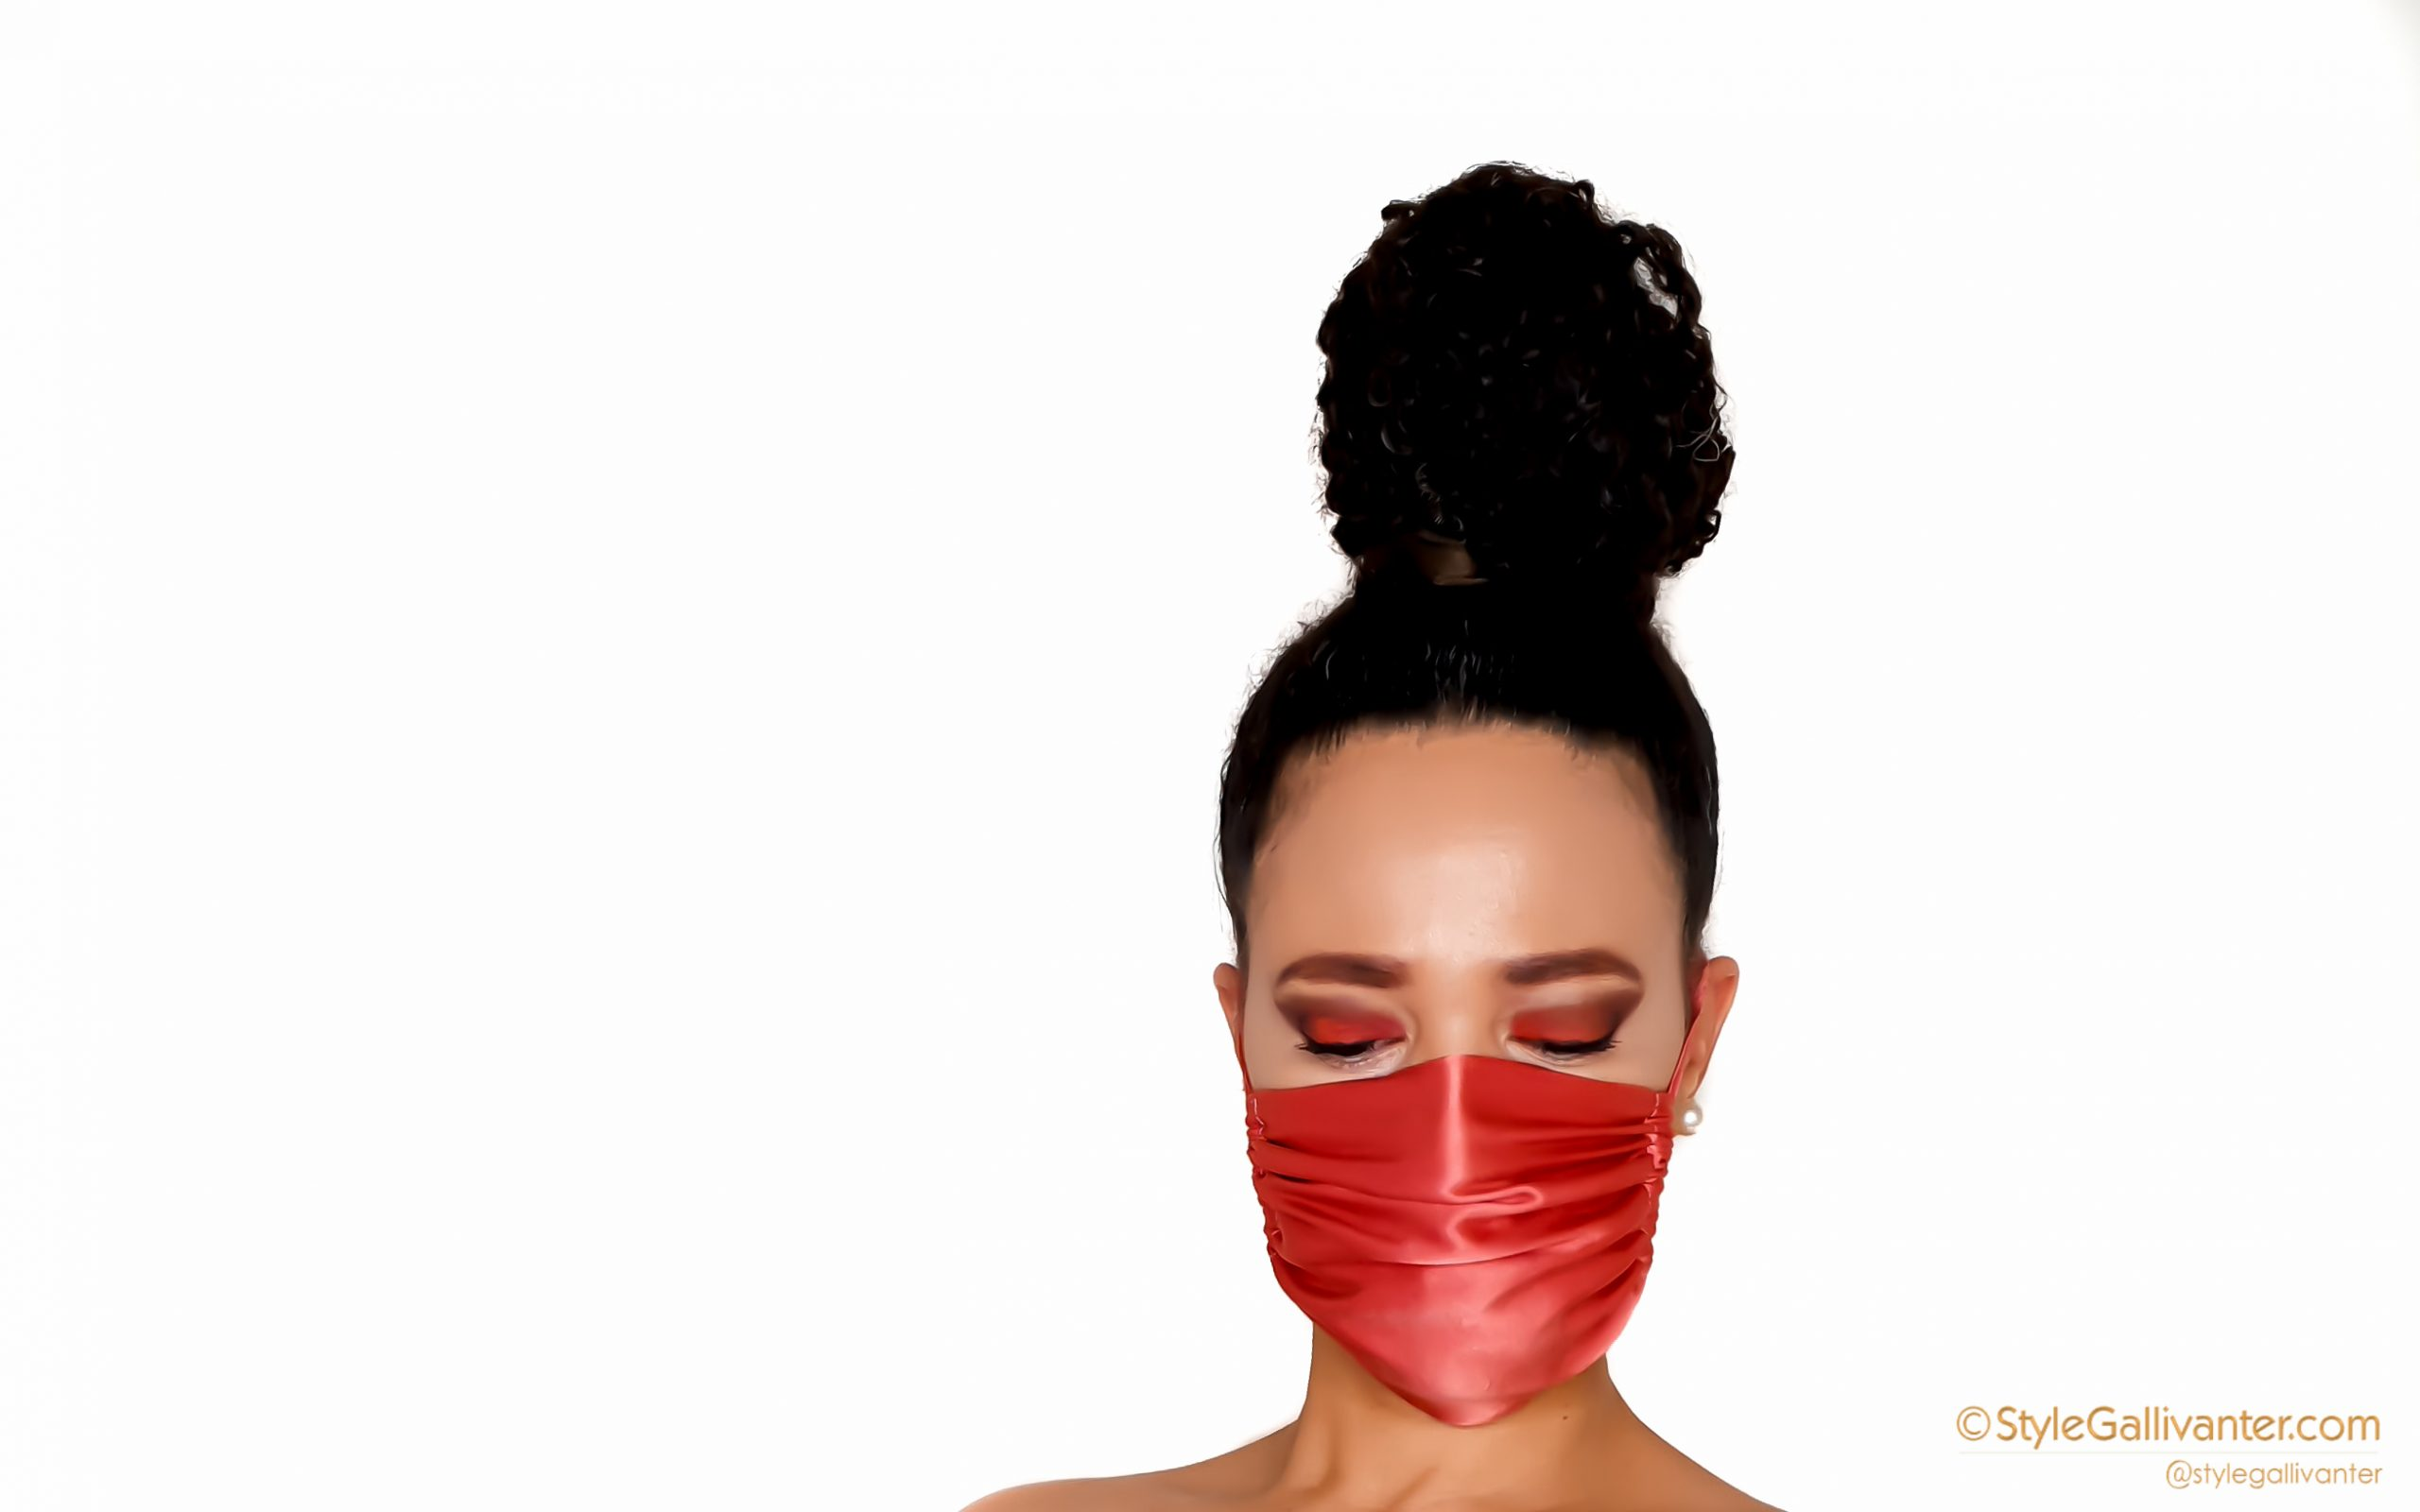 100% mulberry silk facemask australia, mulberry silk face masks Australia, KALAHARI-INK-best-facemasks-australia-stylish-face-masks-australia-luxury-face-mask-australia-good-quality-facemasks-australia-minimalist-face-masks-australia-pure-silk-face-masks-australia, affordable face masks australia, fabric face mask australia, most stylish face mask australia, fashion face mask australia, high end face mask australia